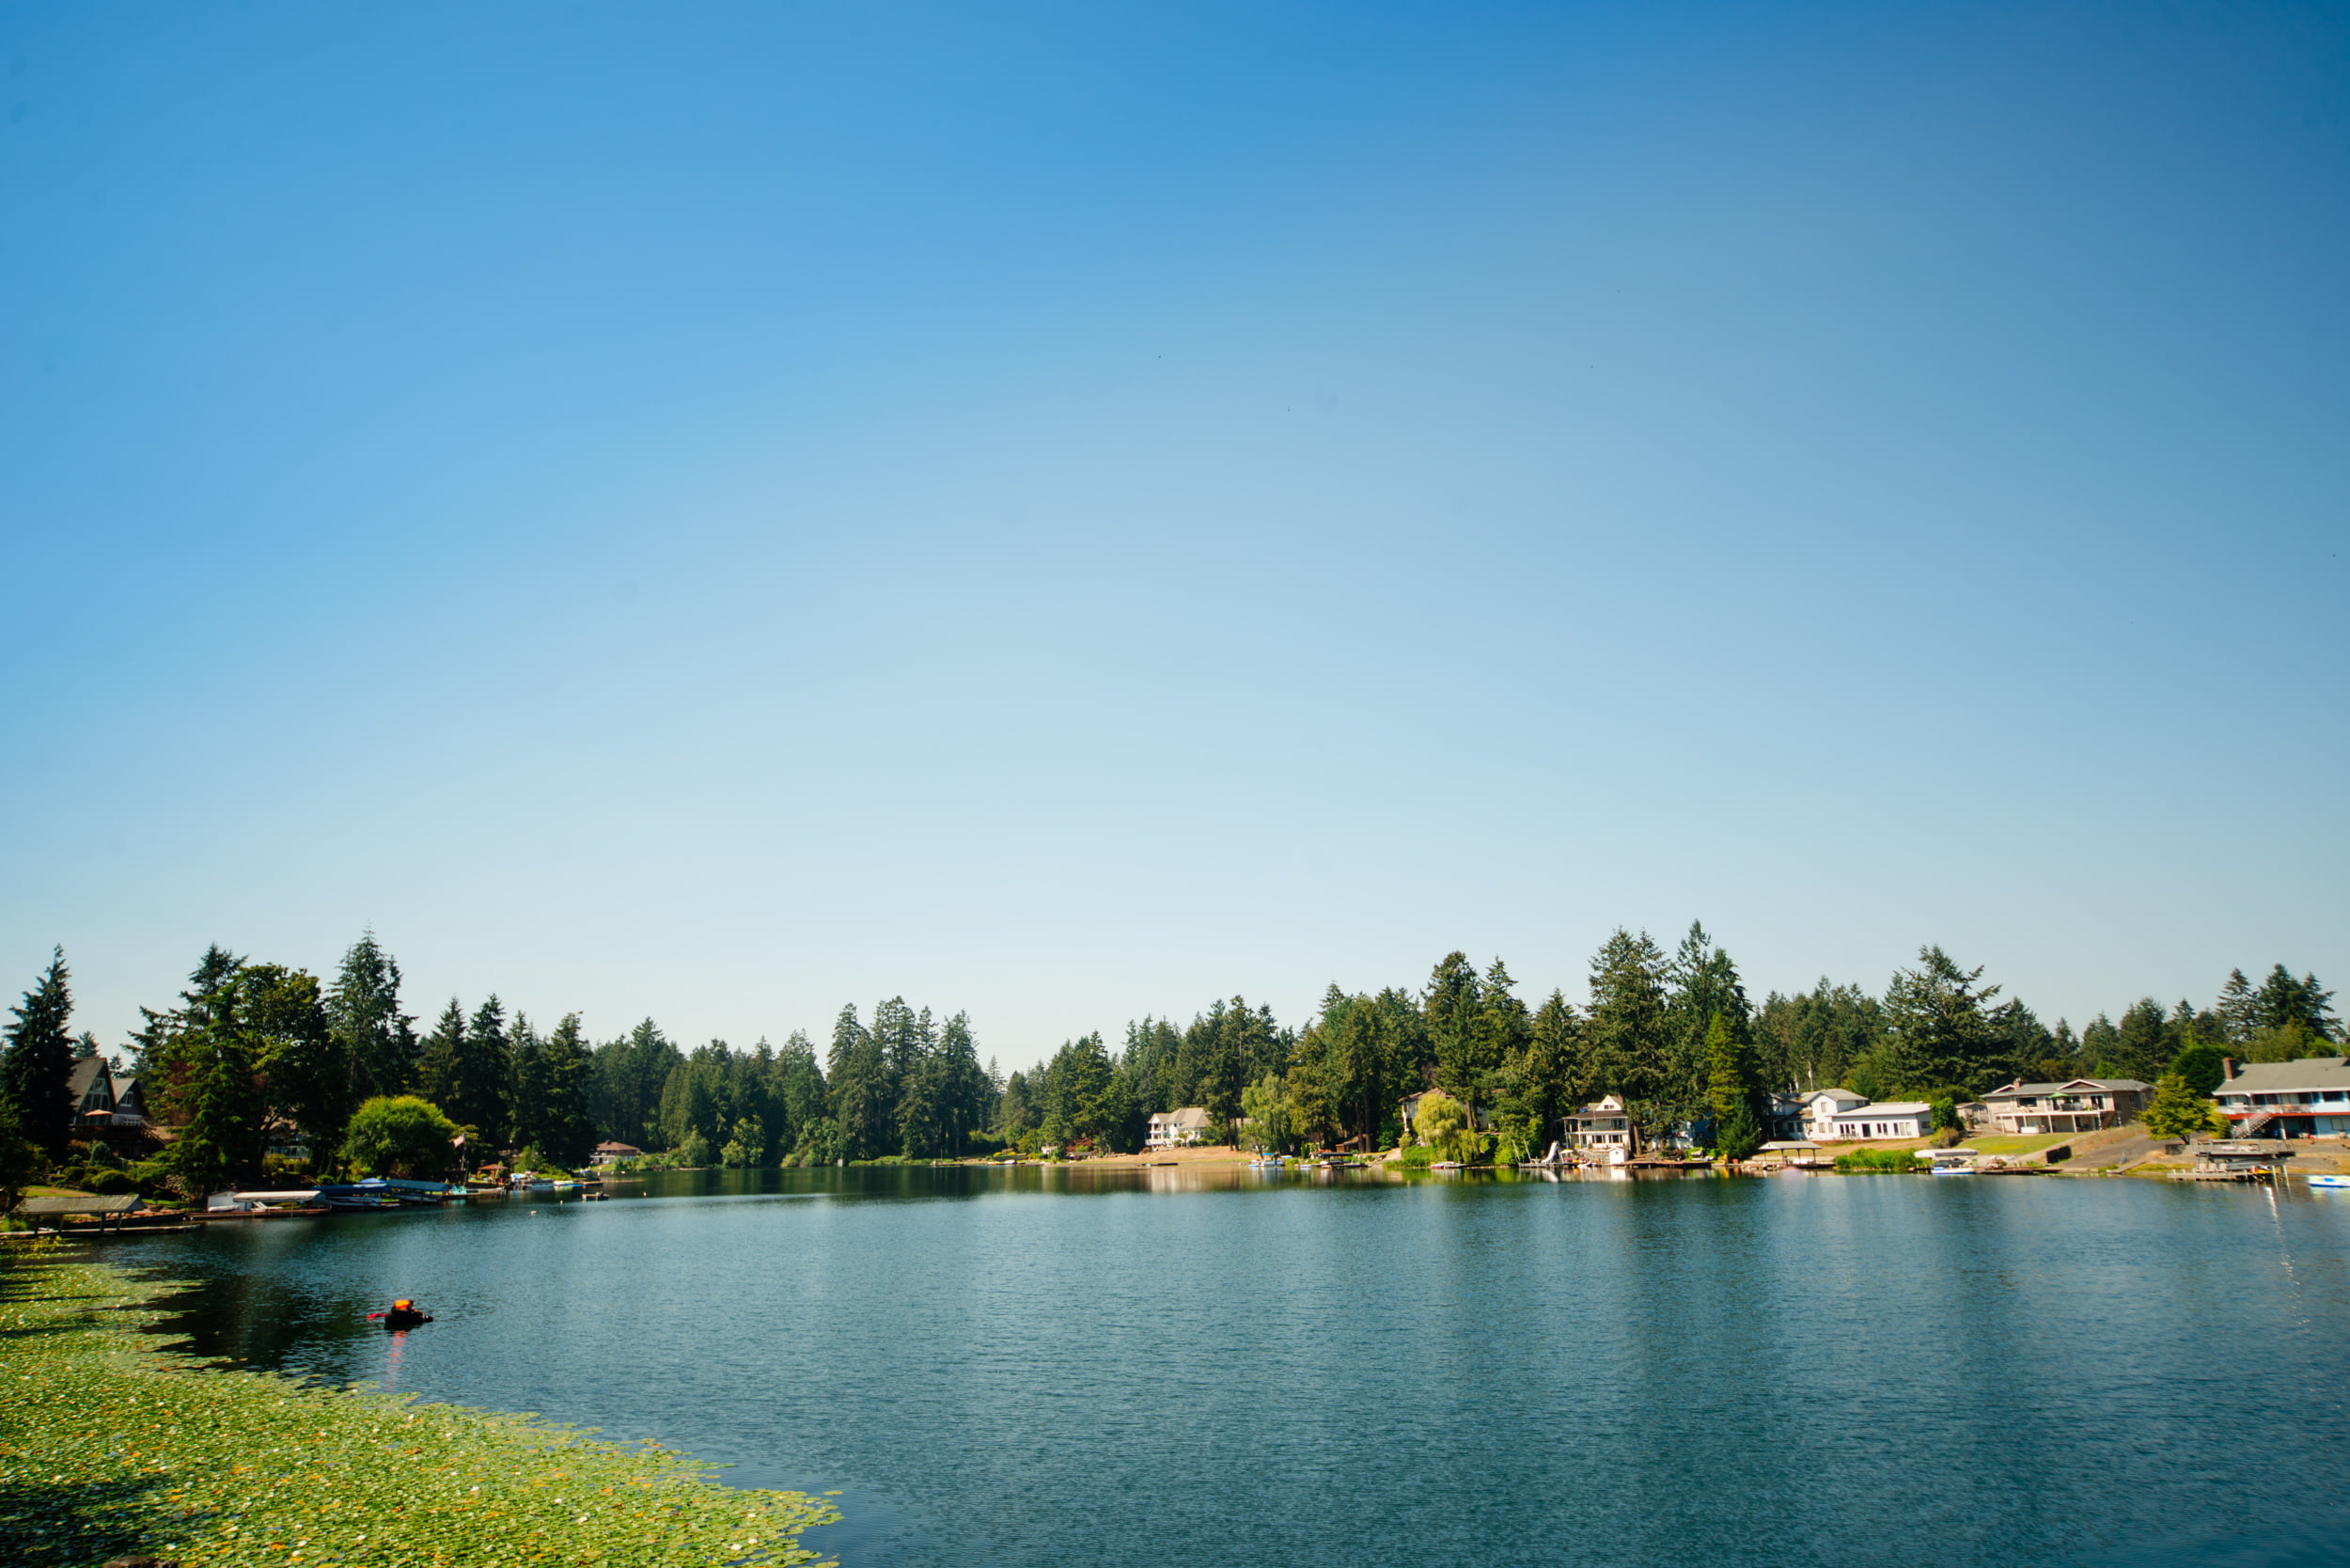 spanaway lake homes